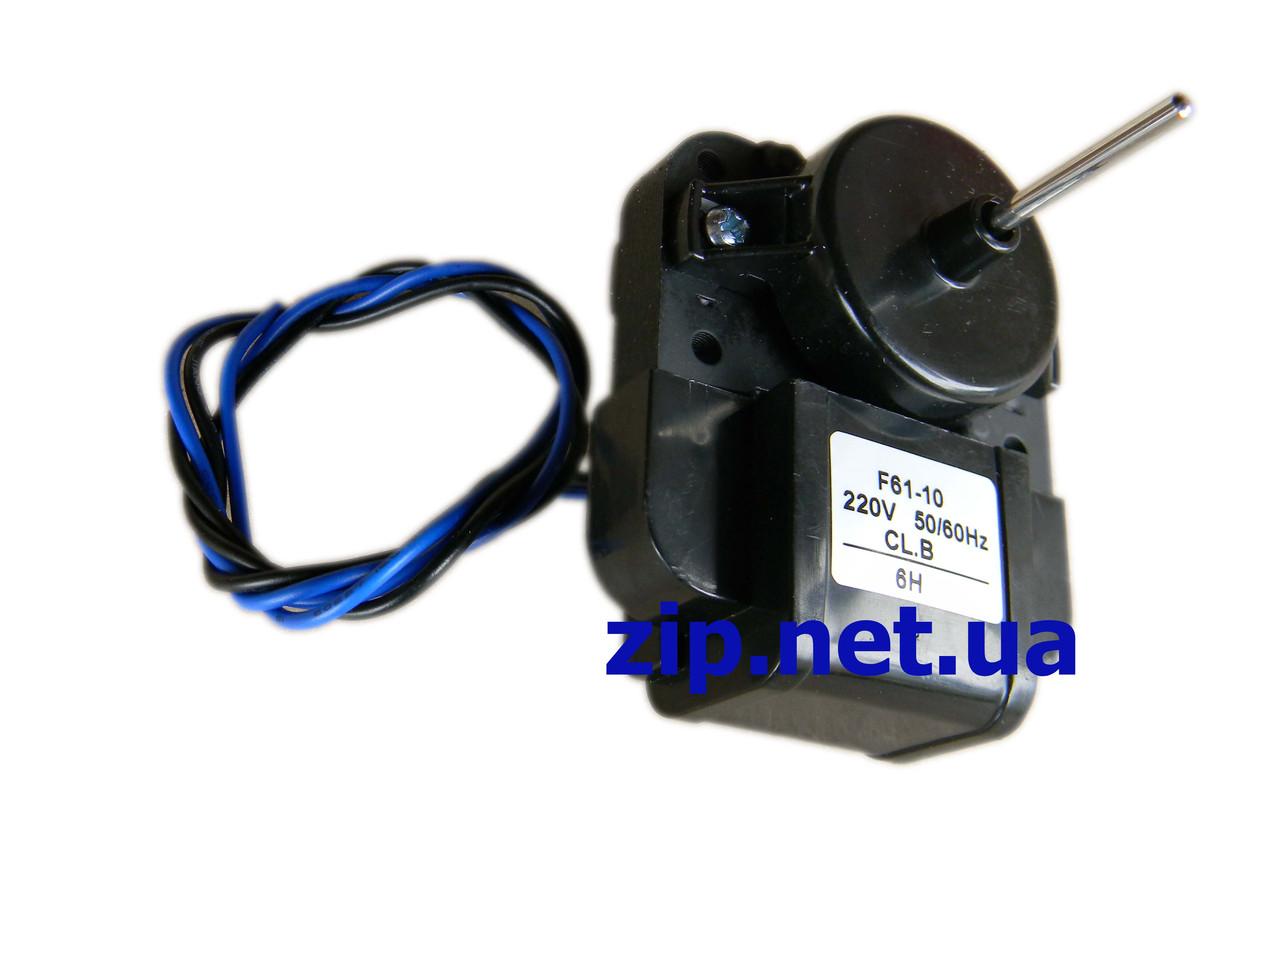 Вентилятор Stinol,Indesit F 61-10 G